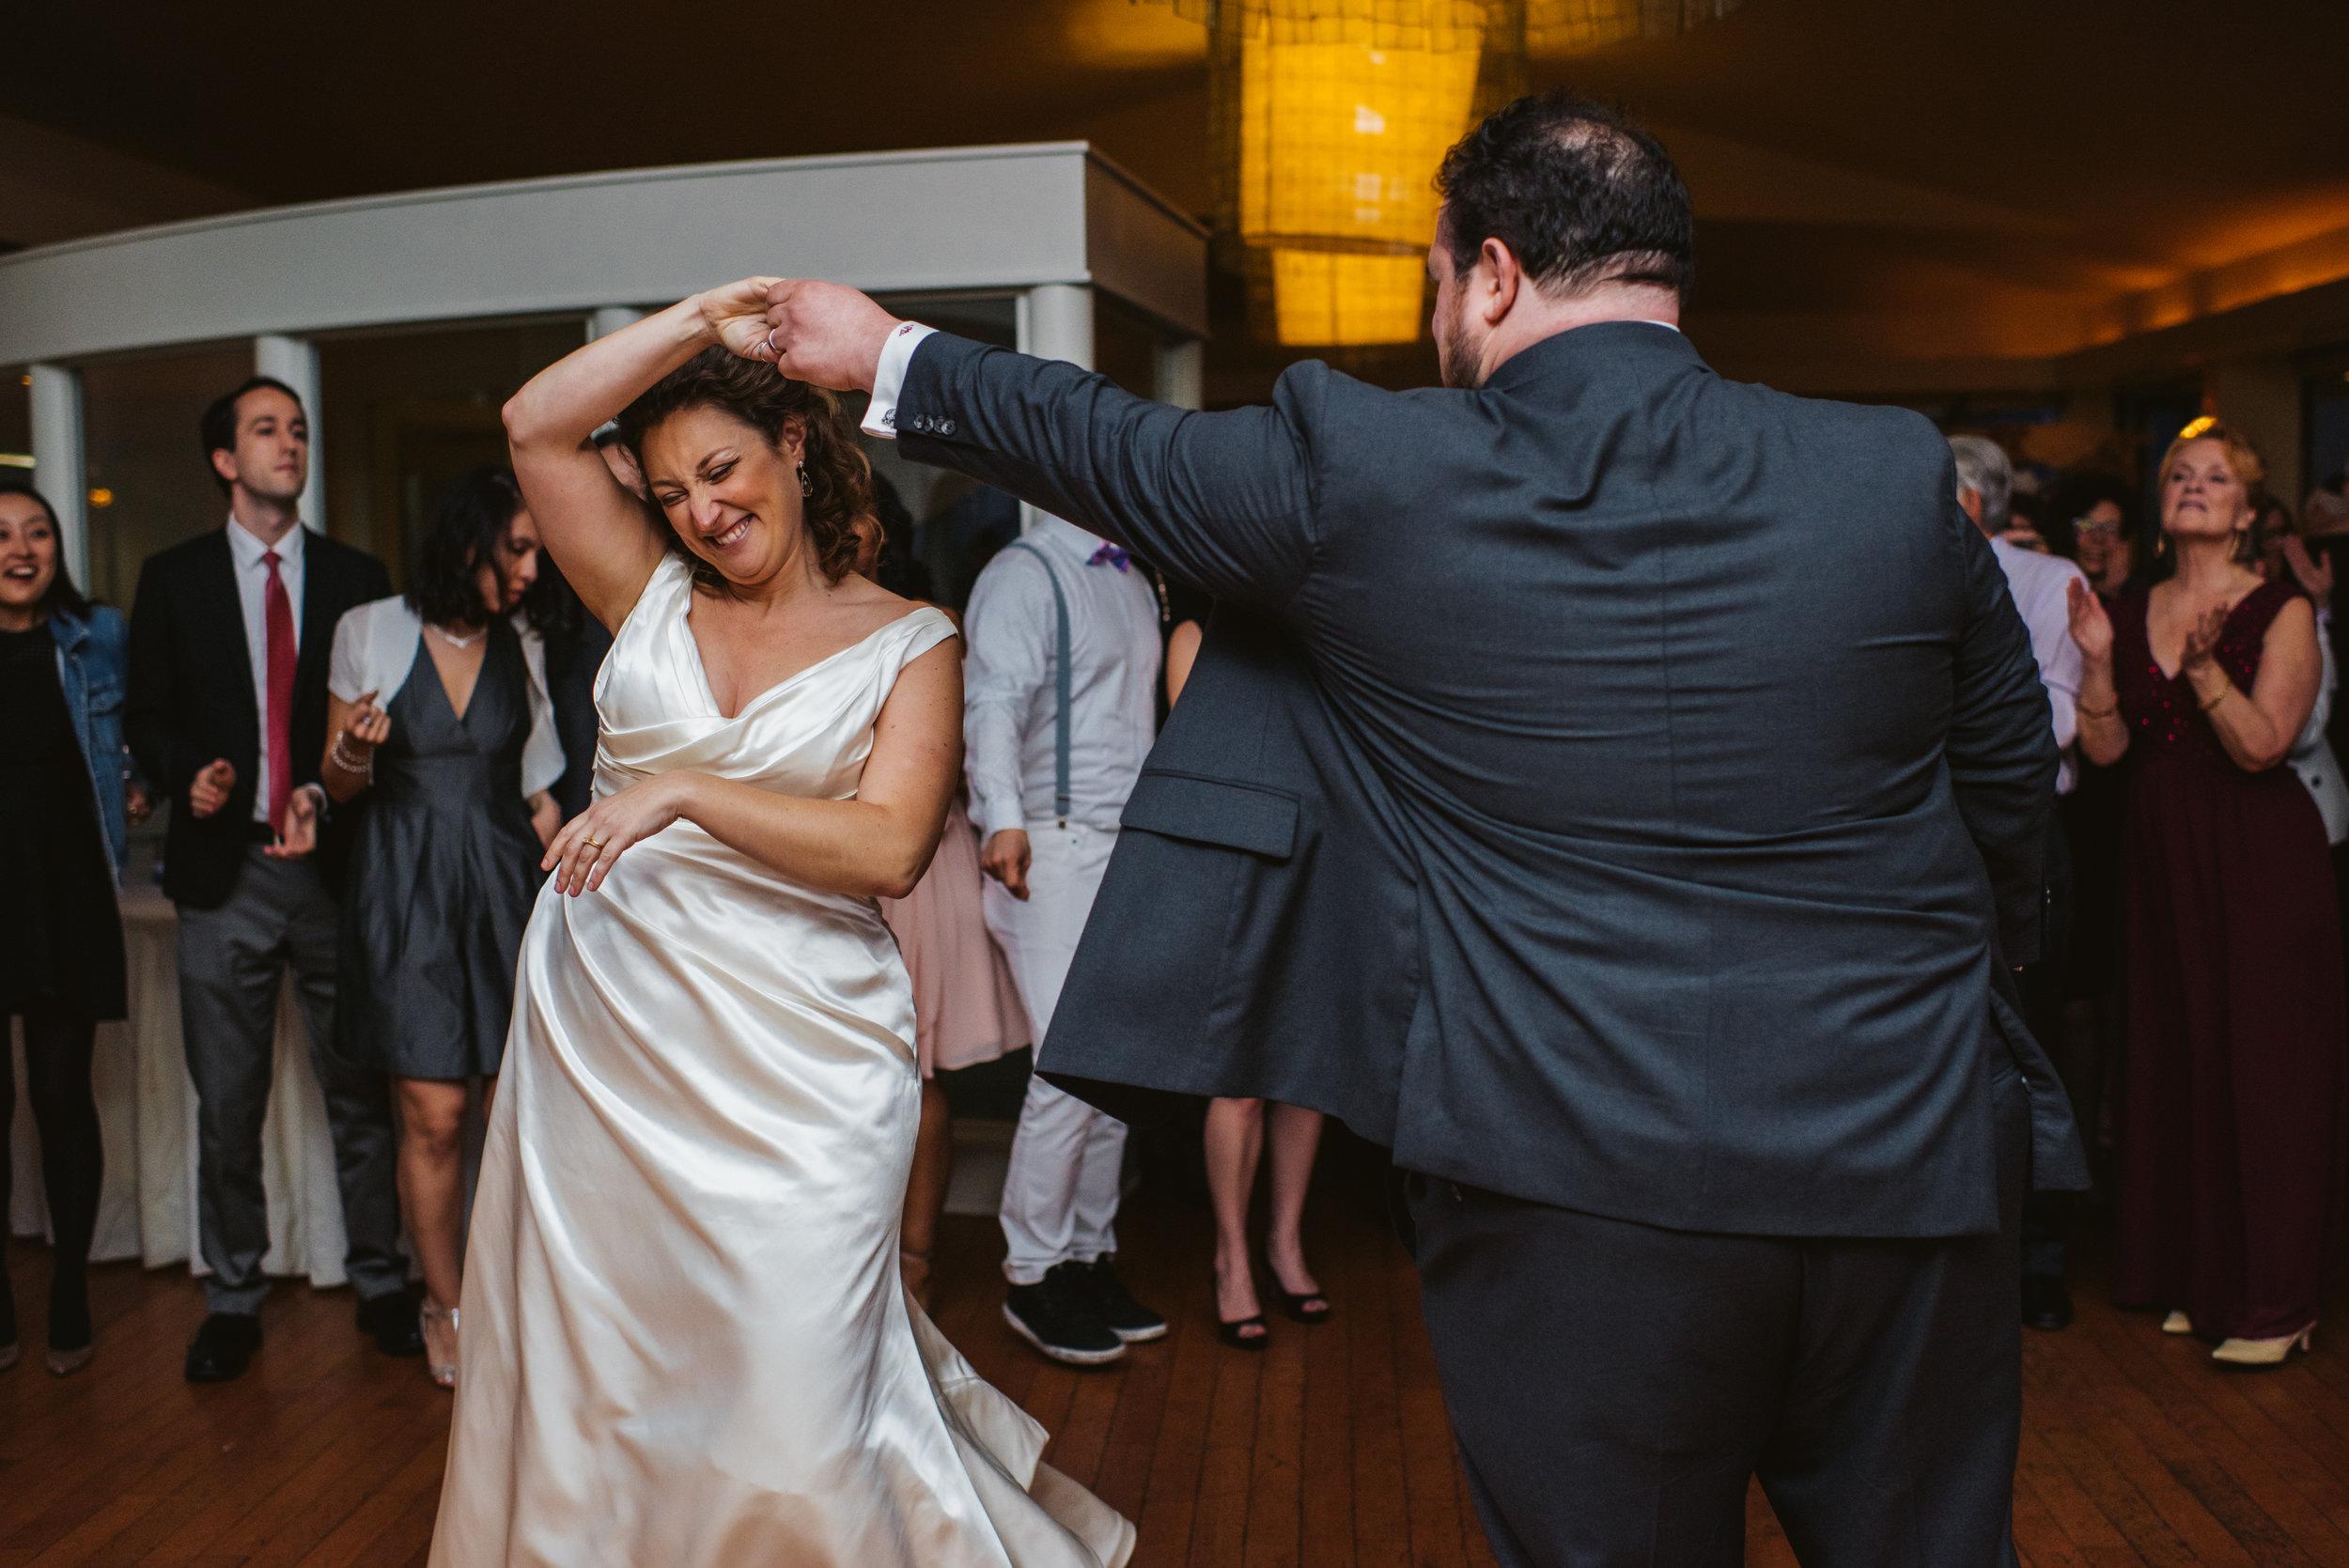 LIZA & JON - BATTERY PARK WEDDING - NYC INTIMATE WEDDING PHOTOGRAPHER - CHI-CHI AGBIM-677.jpg